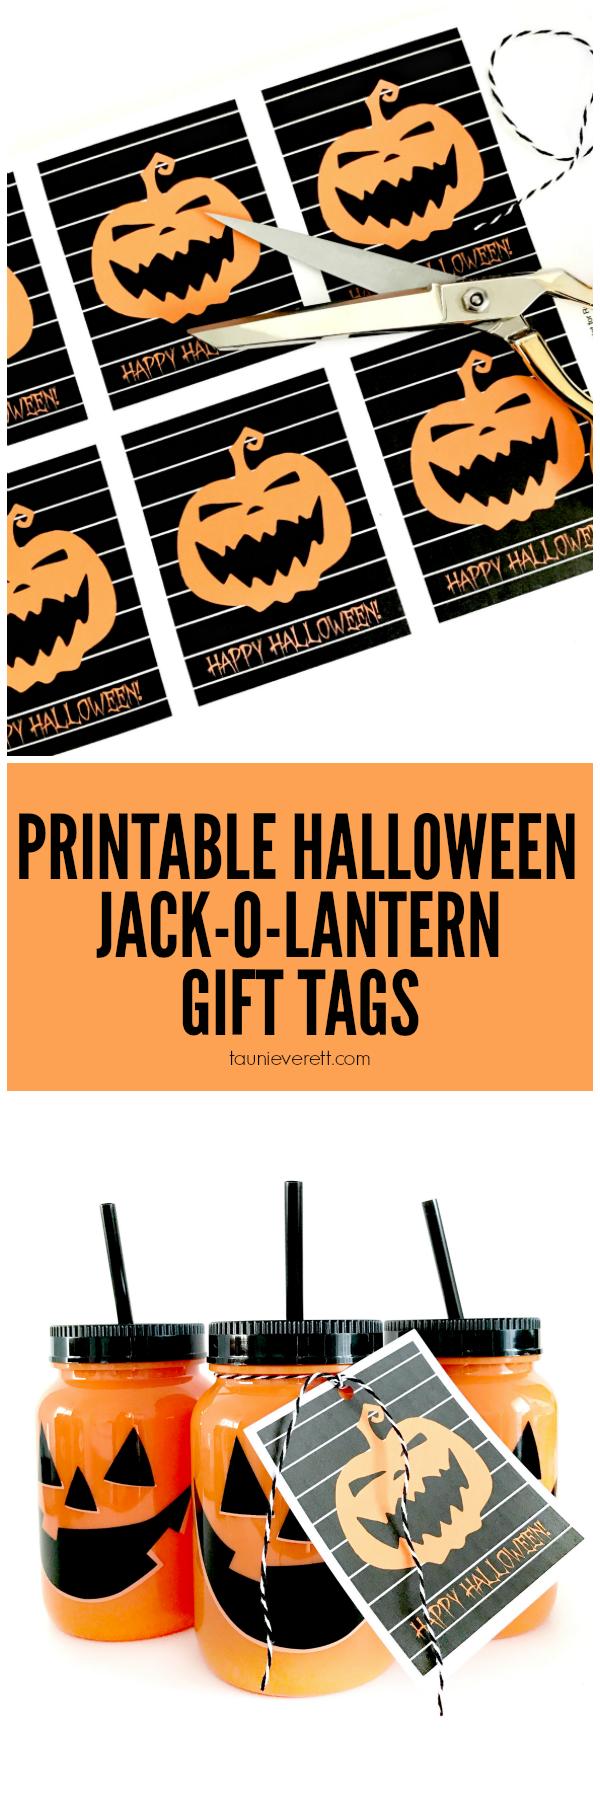 graphic about Free Printable Halloween Gift Tags called Jack-O-Lantern Halloween Printable Reward Tag - 1825